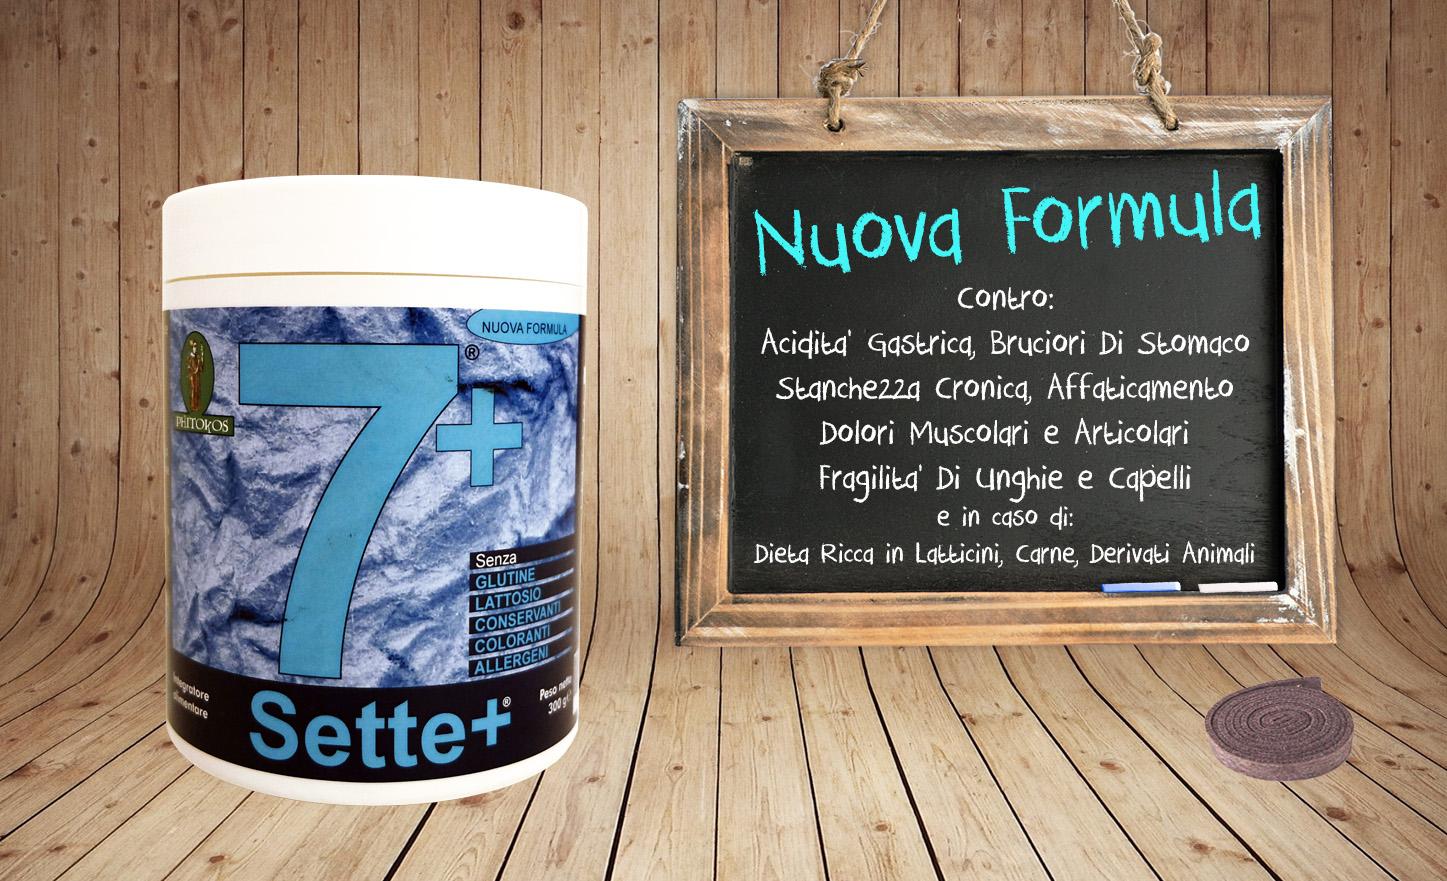 Sette+ Nuova Formula